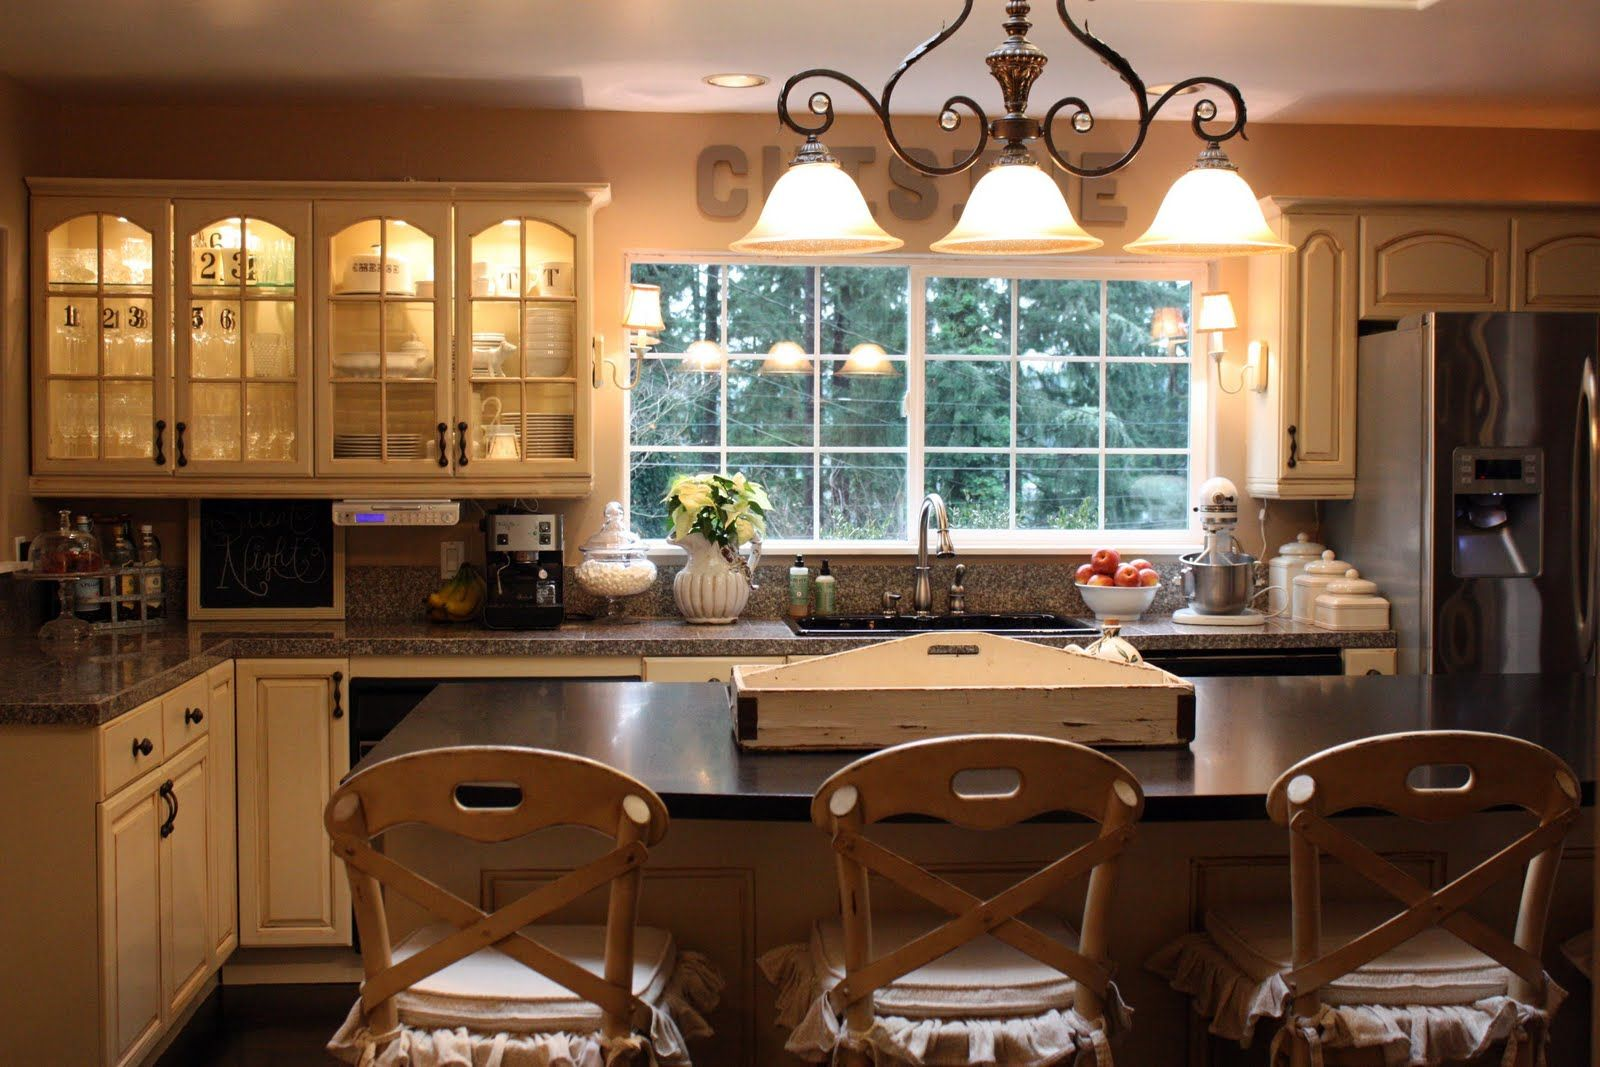 My Sweet Savannah Remodeling Ideas Kitchen Kitchen Cabinet